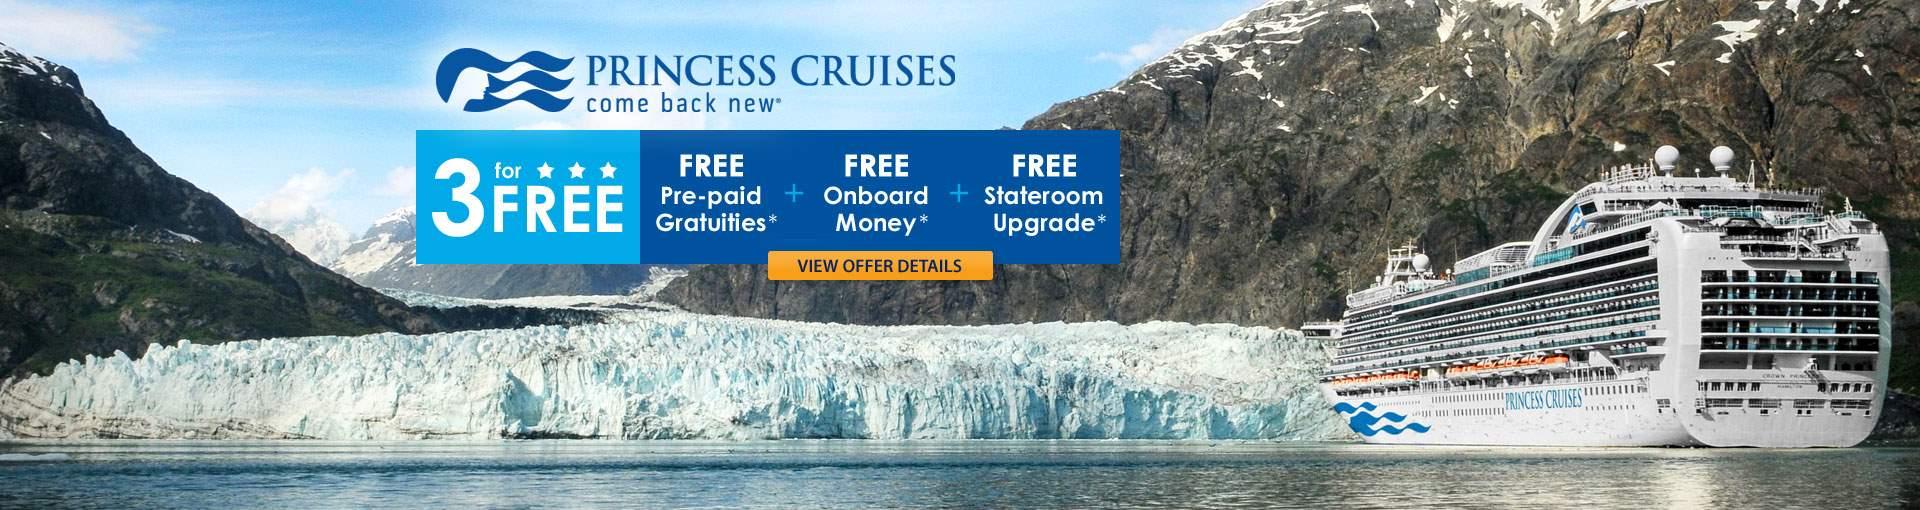 Princes Cruises: 3 for FREE Sale